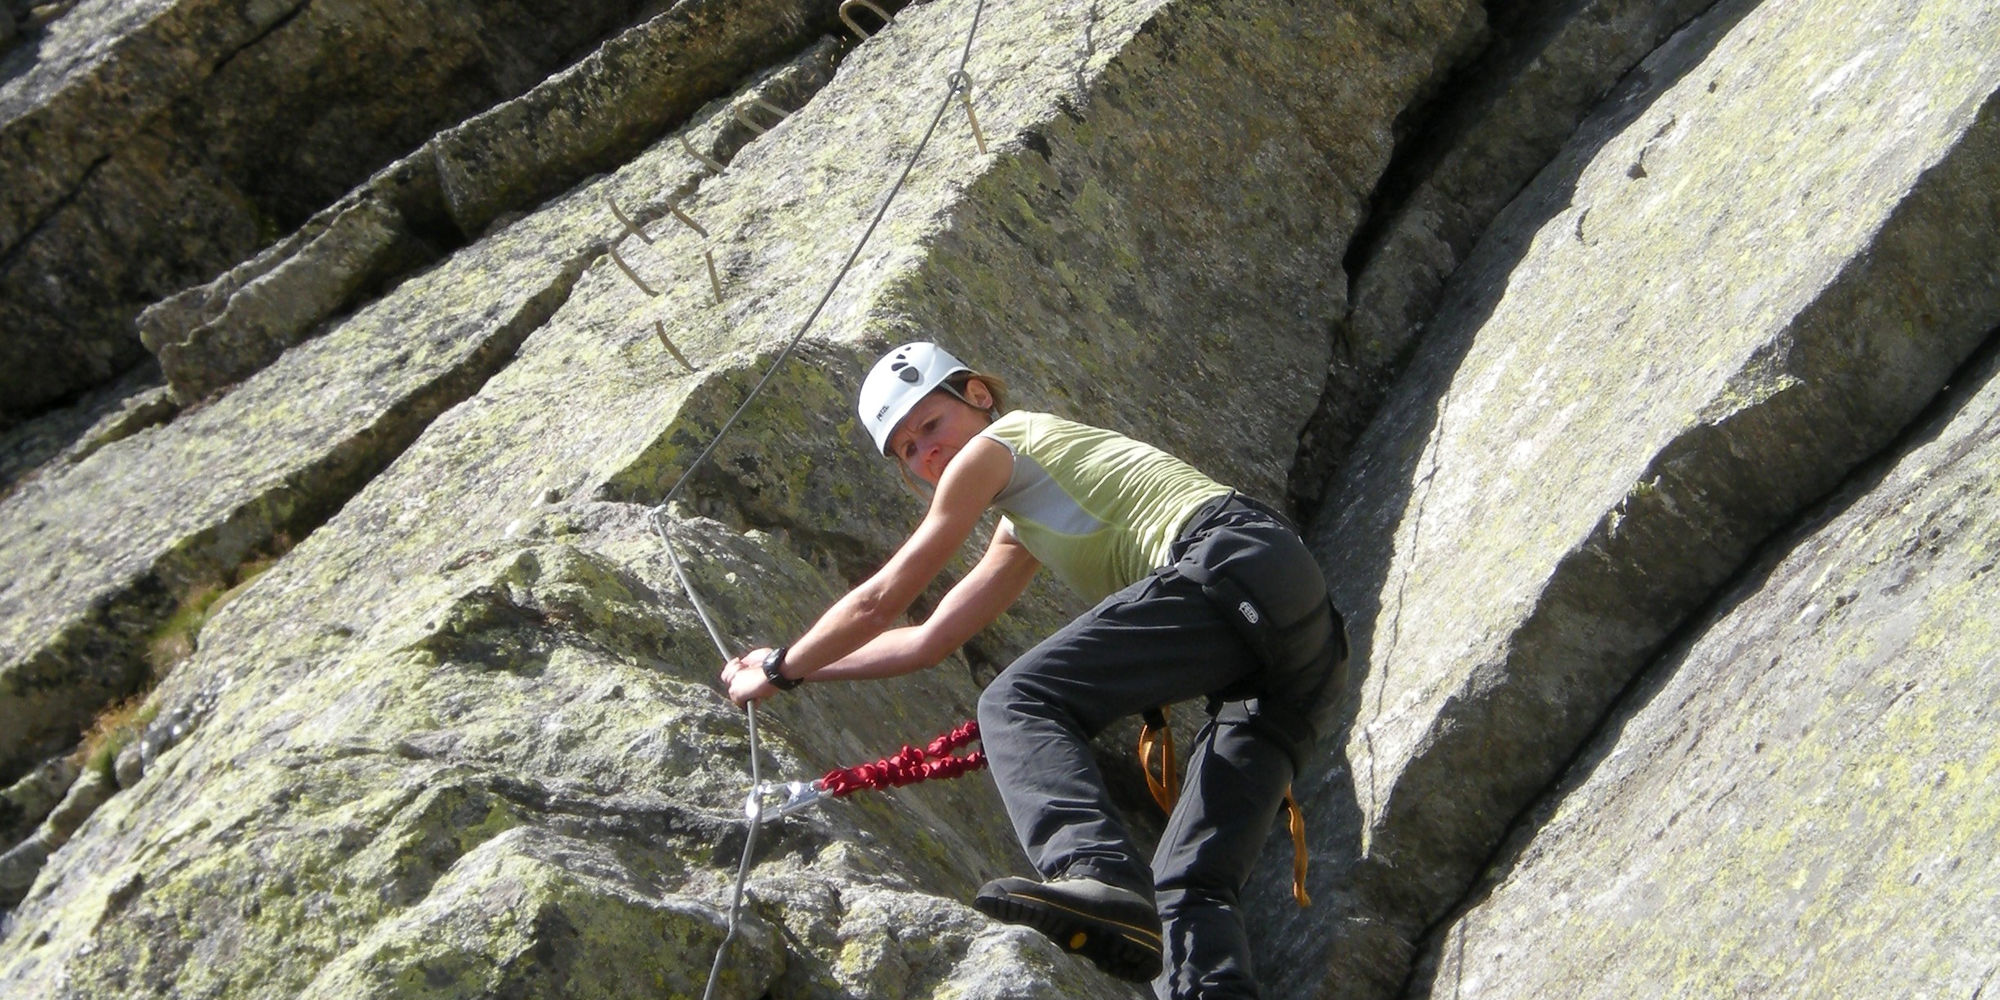 Klettern Klettersteige in der Freien Ferienrepublik Saas-Fee